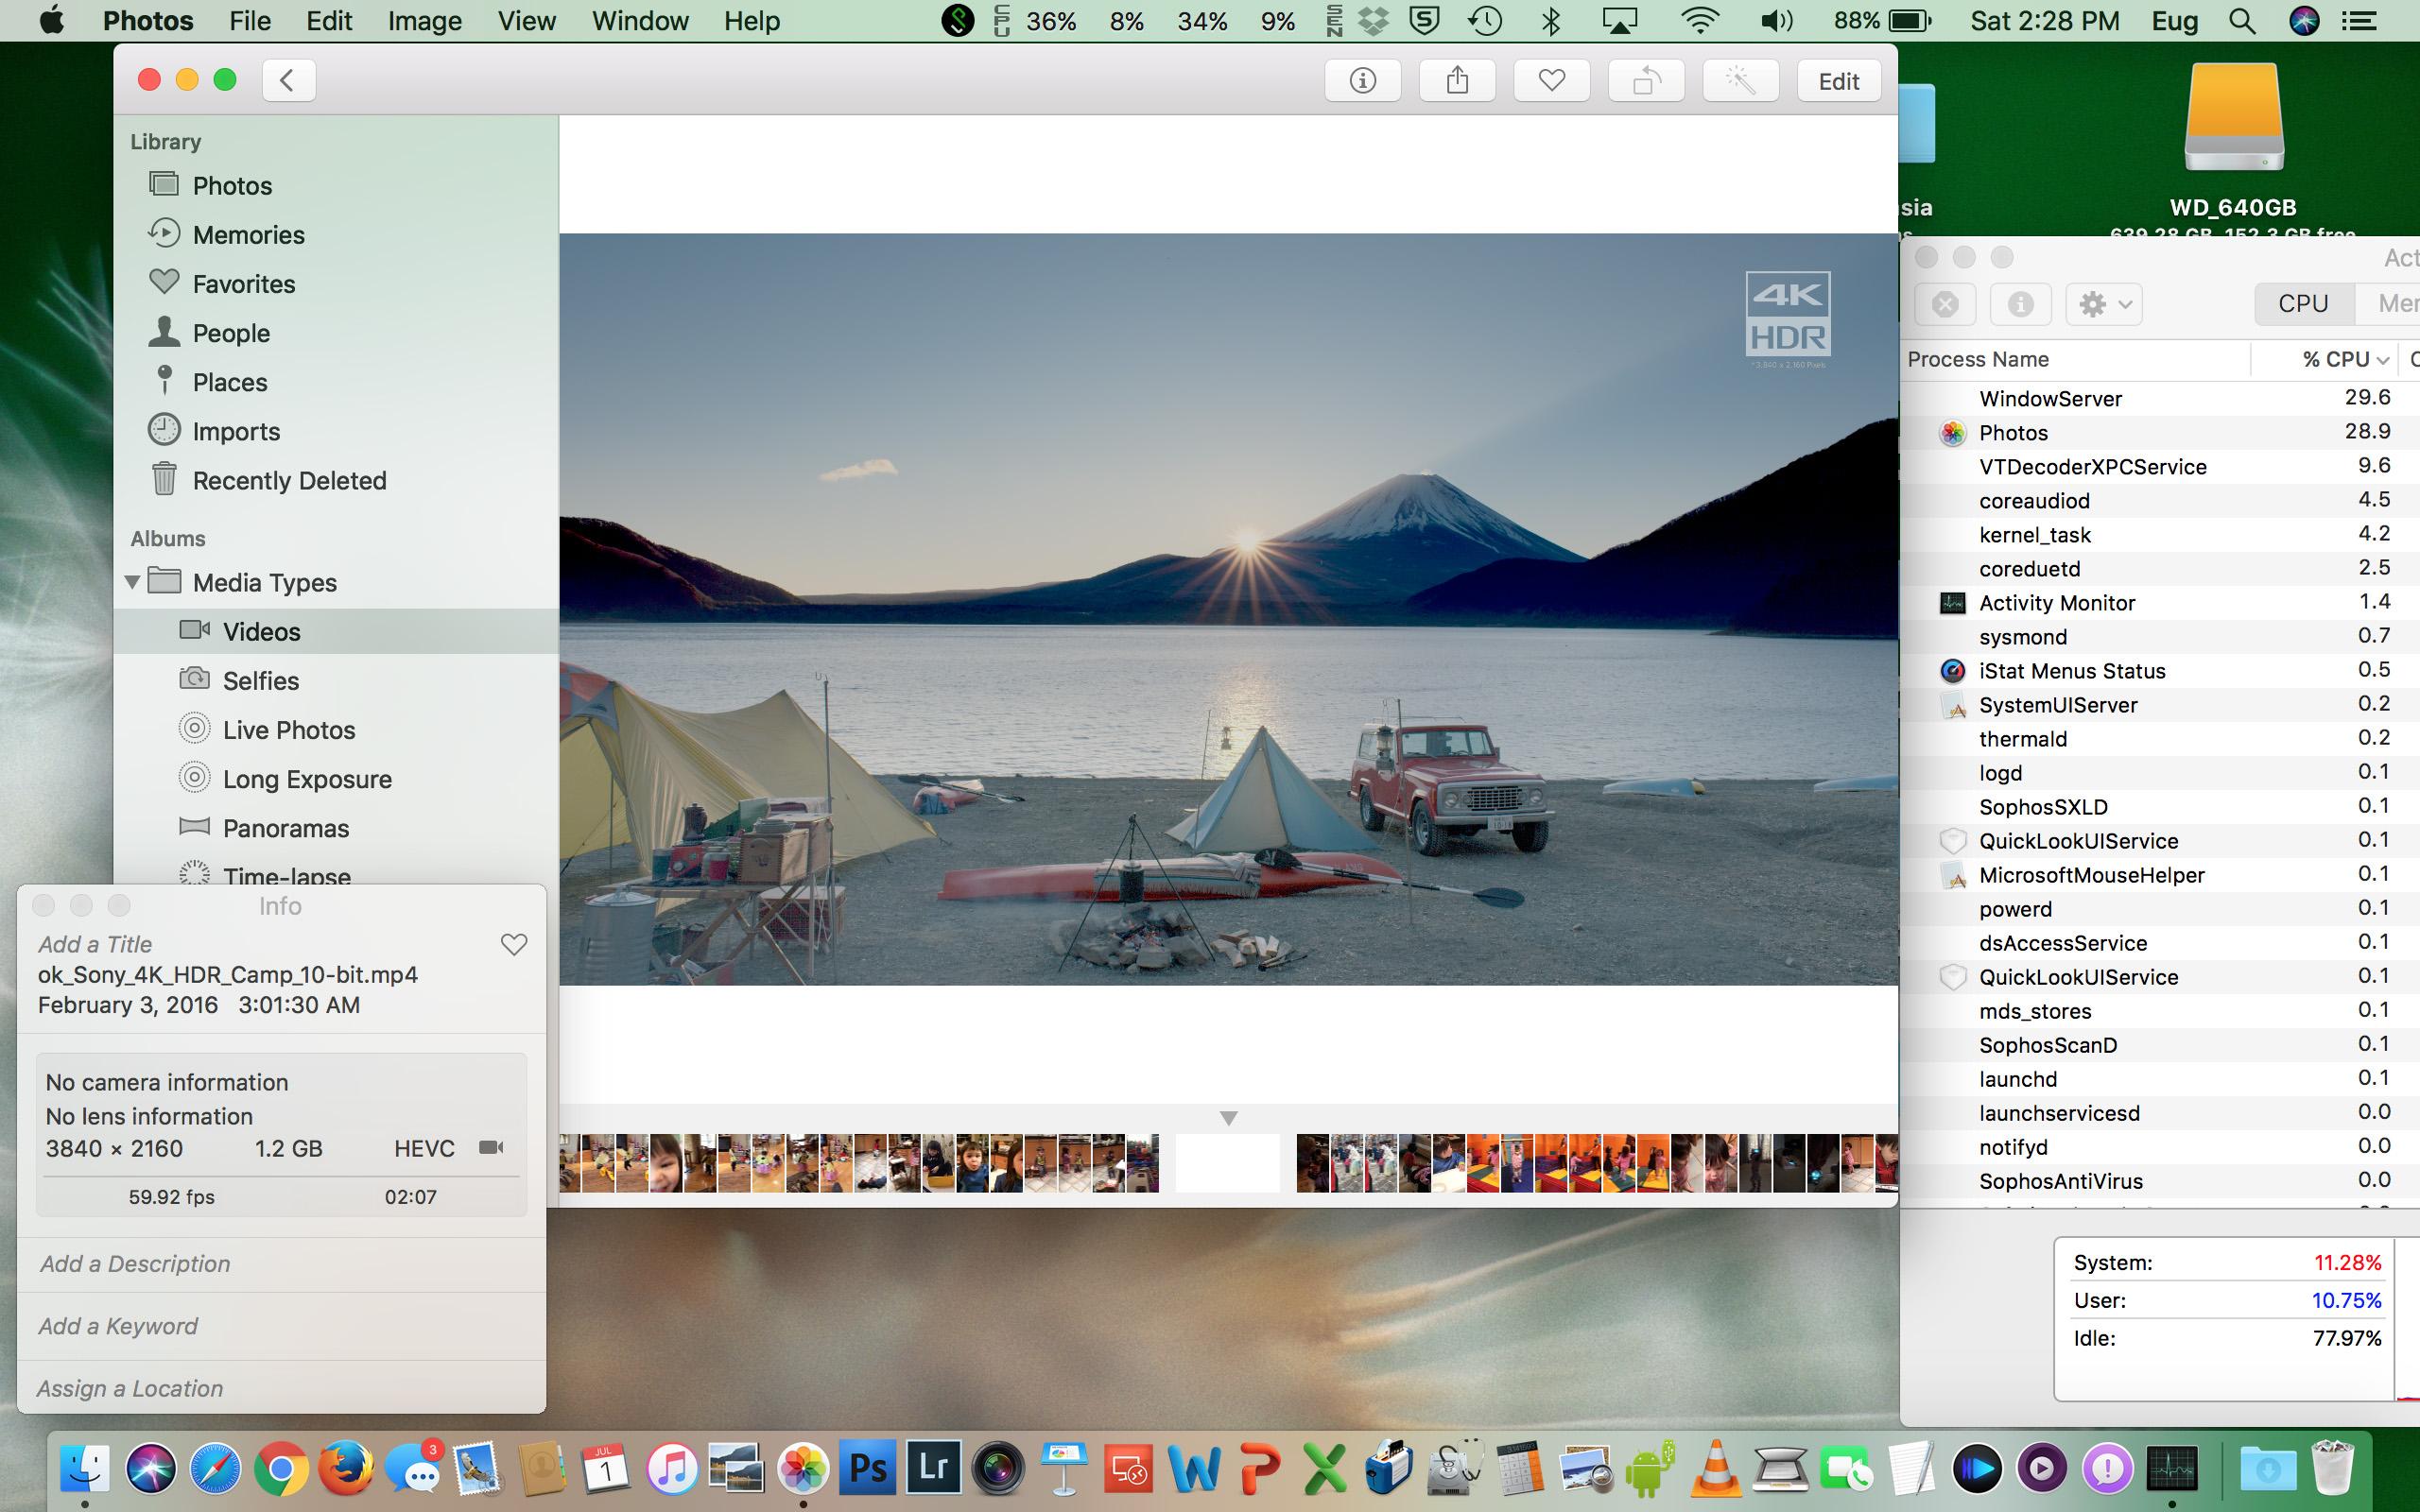 Photos-HEVC.jpg